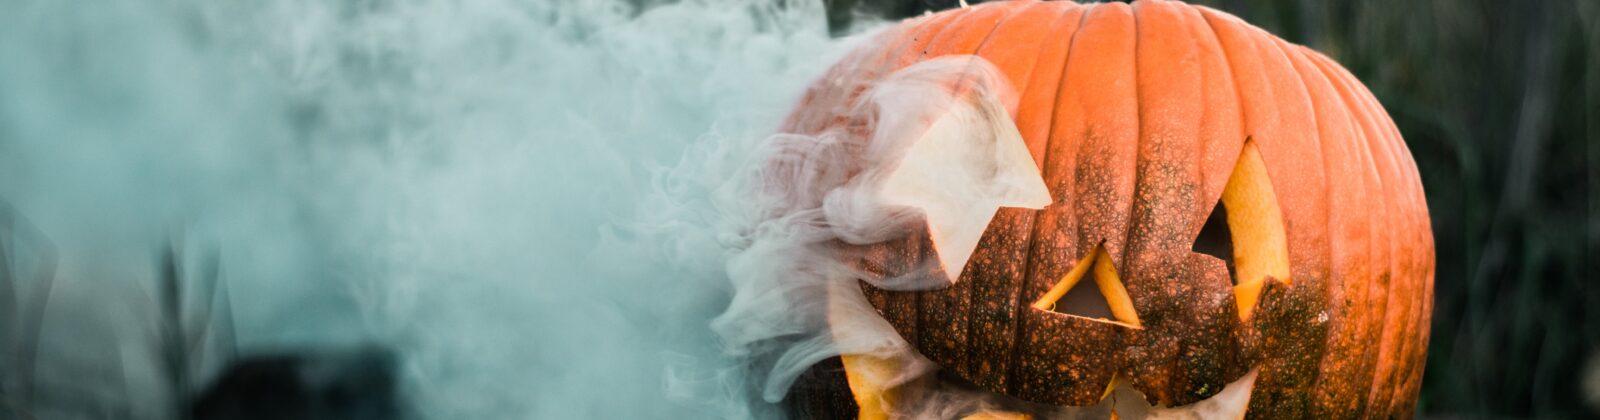 Campaña De Marketing En Halloween